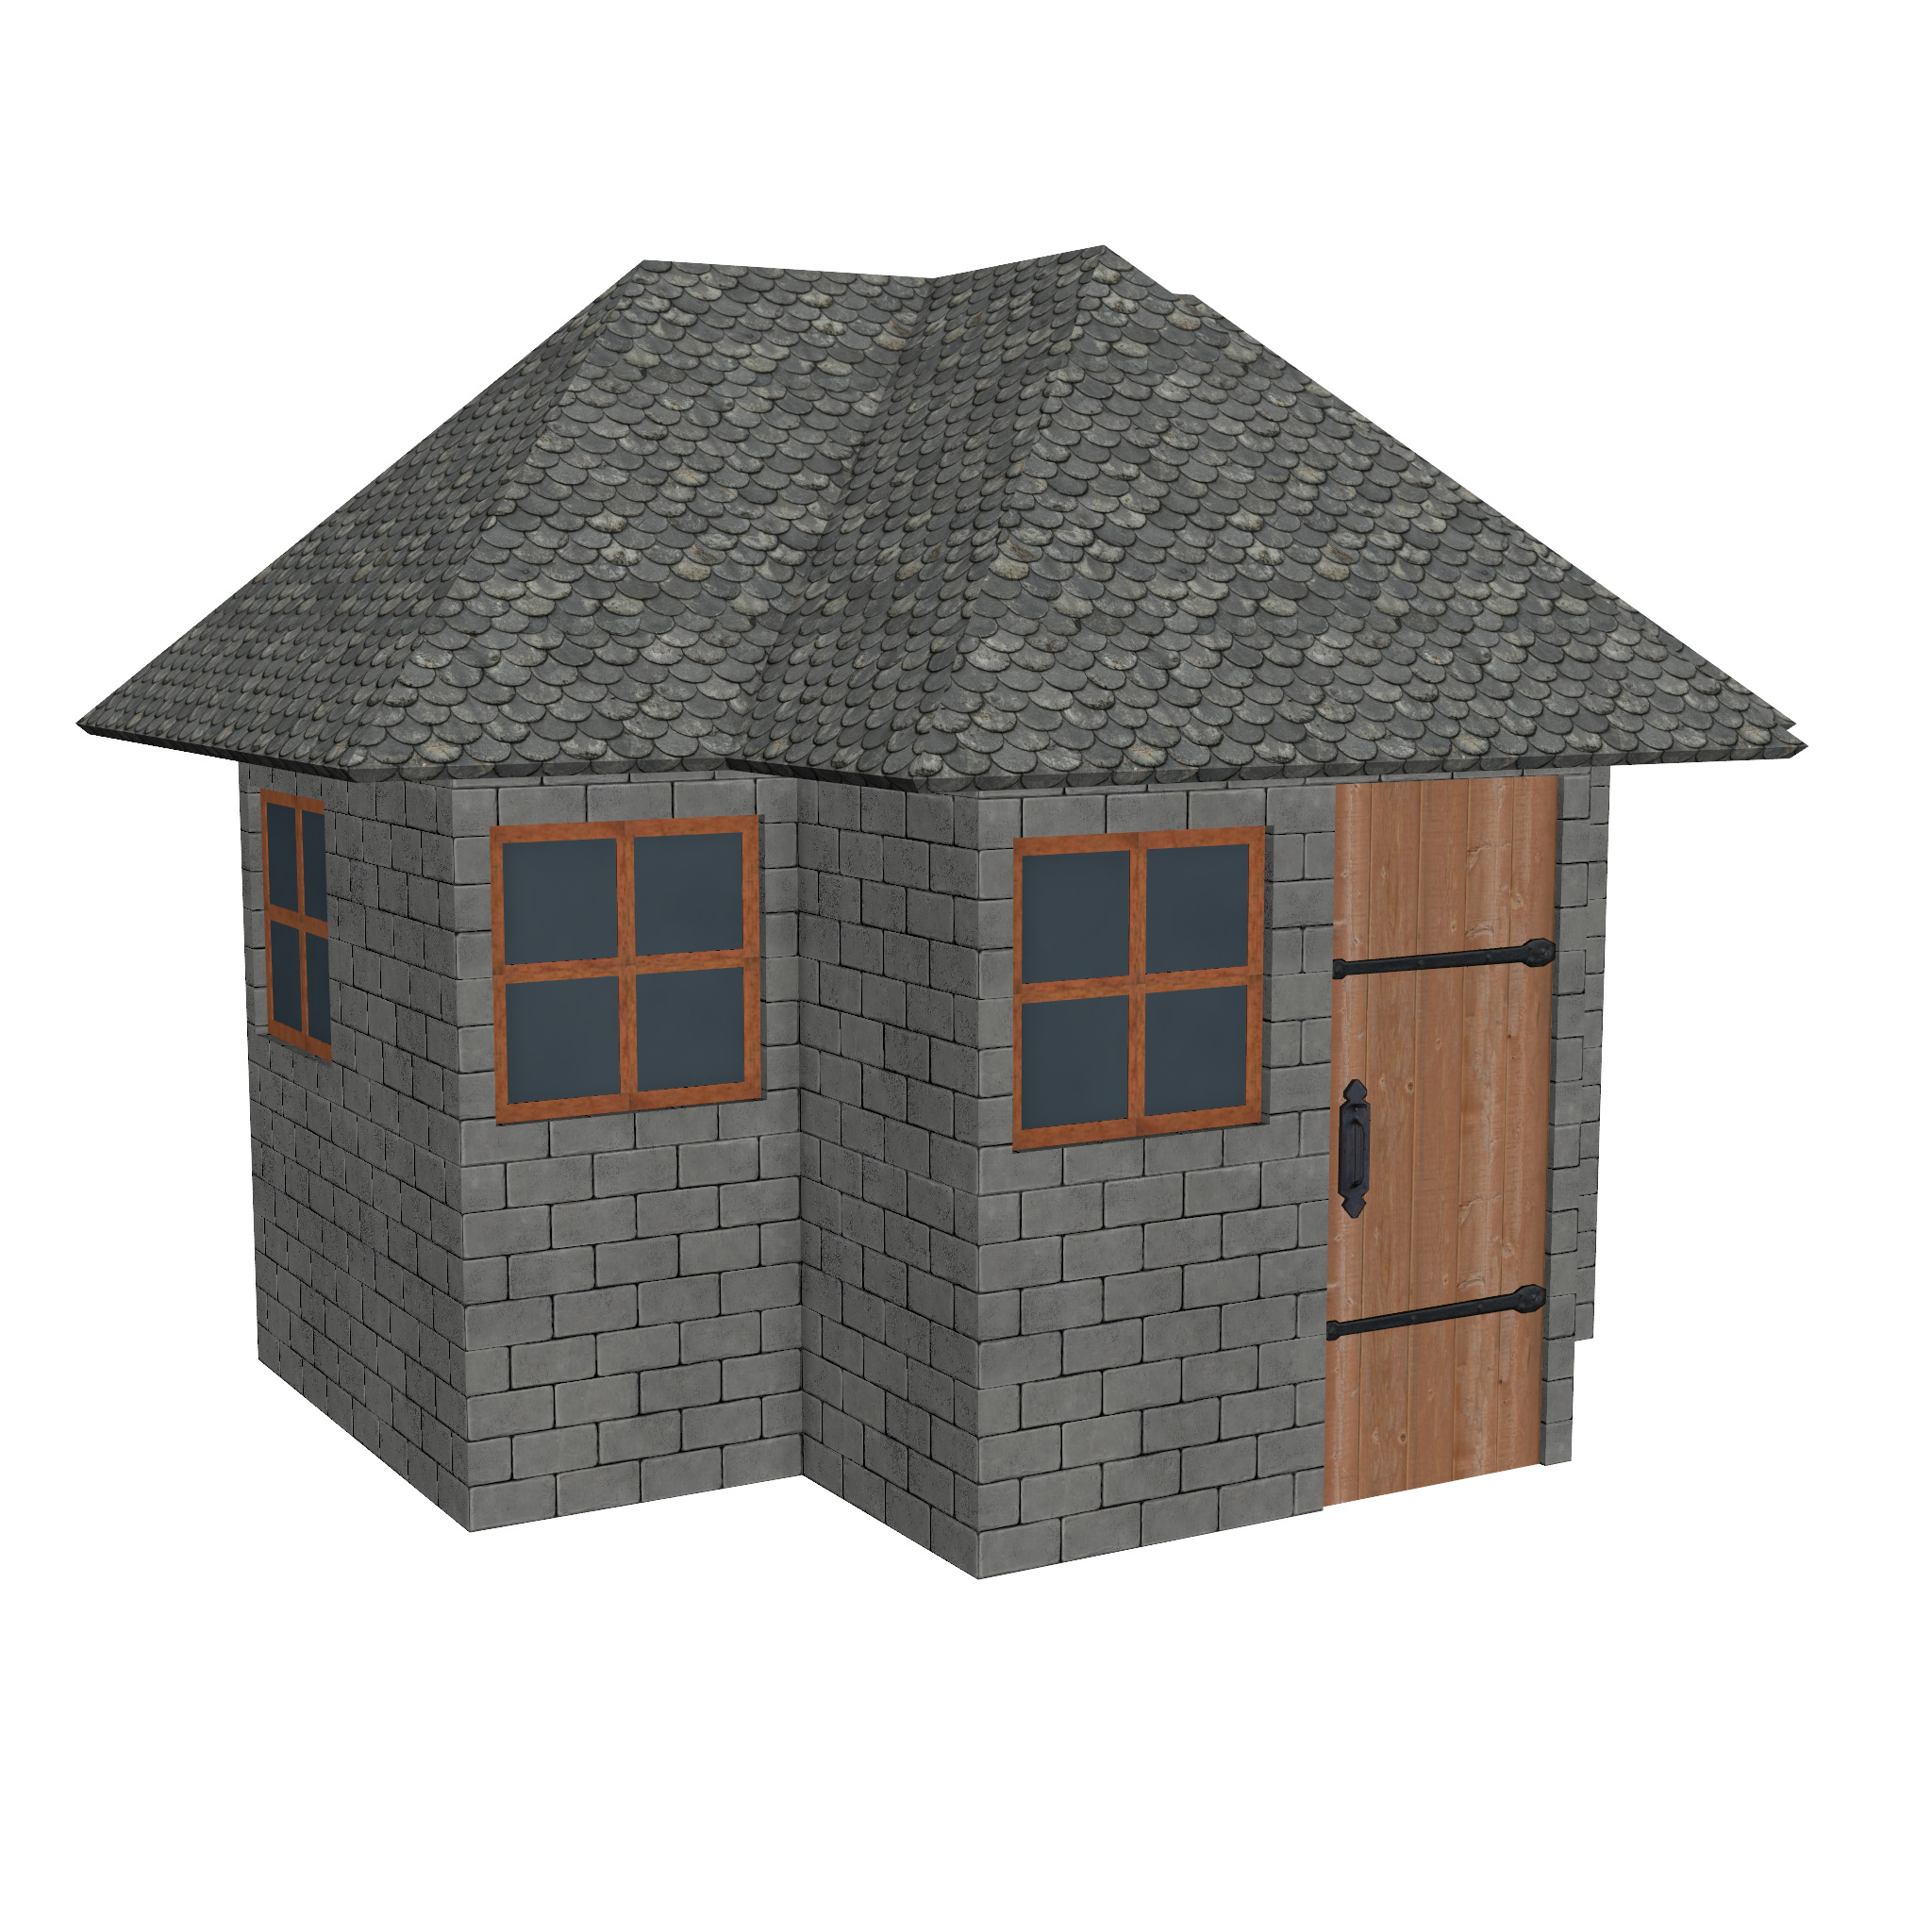 modular brick house set 3d model fbx ma mb 271422